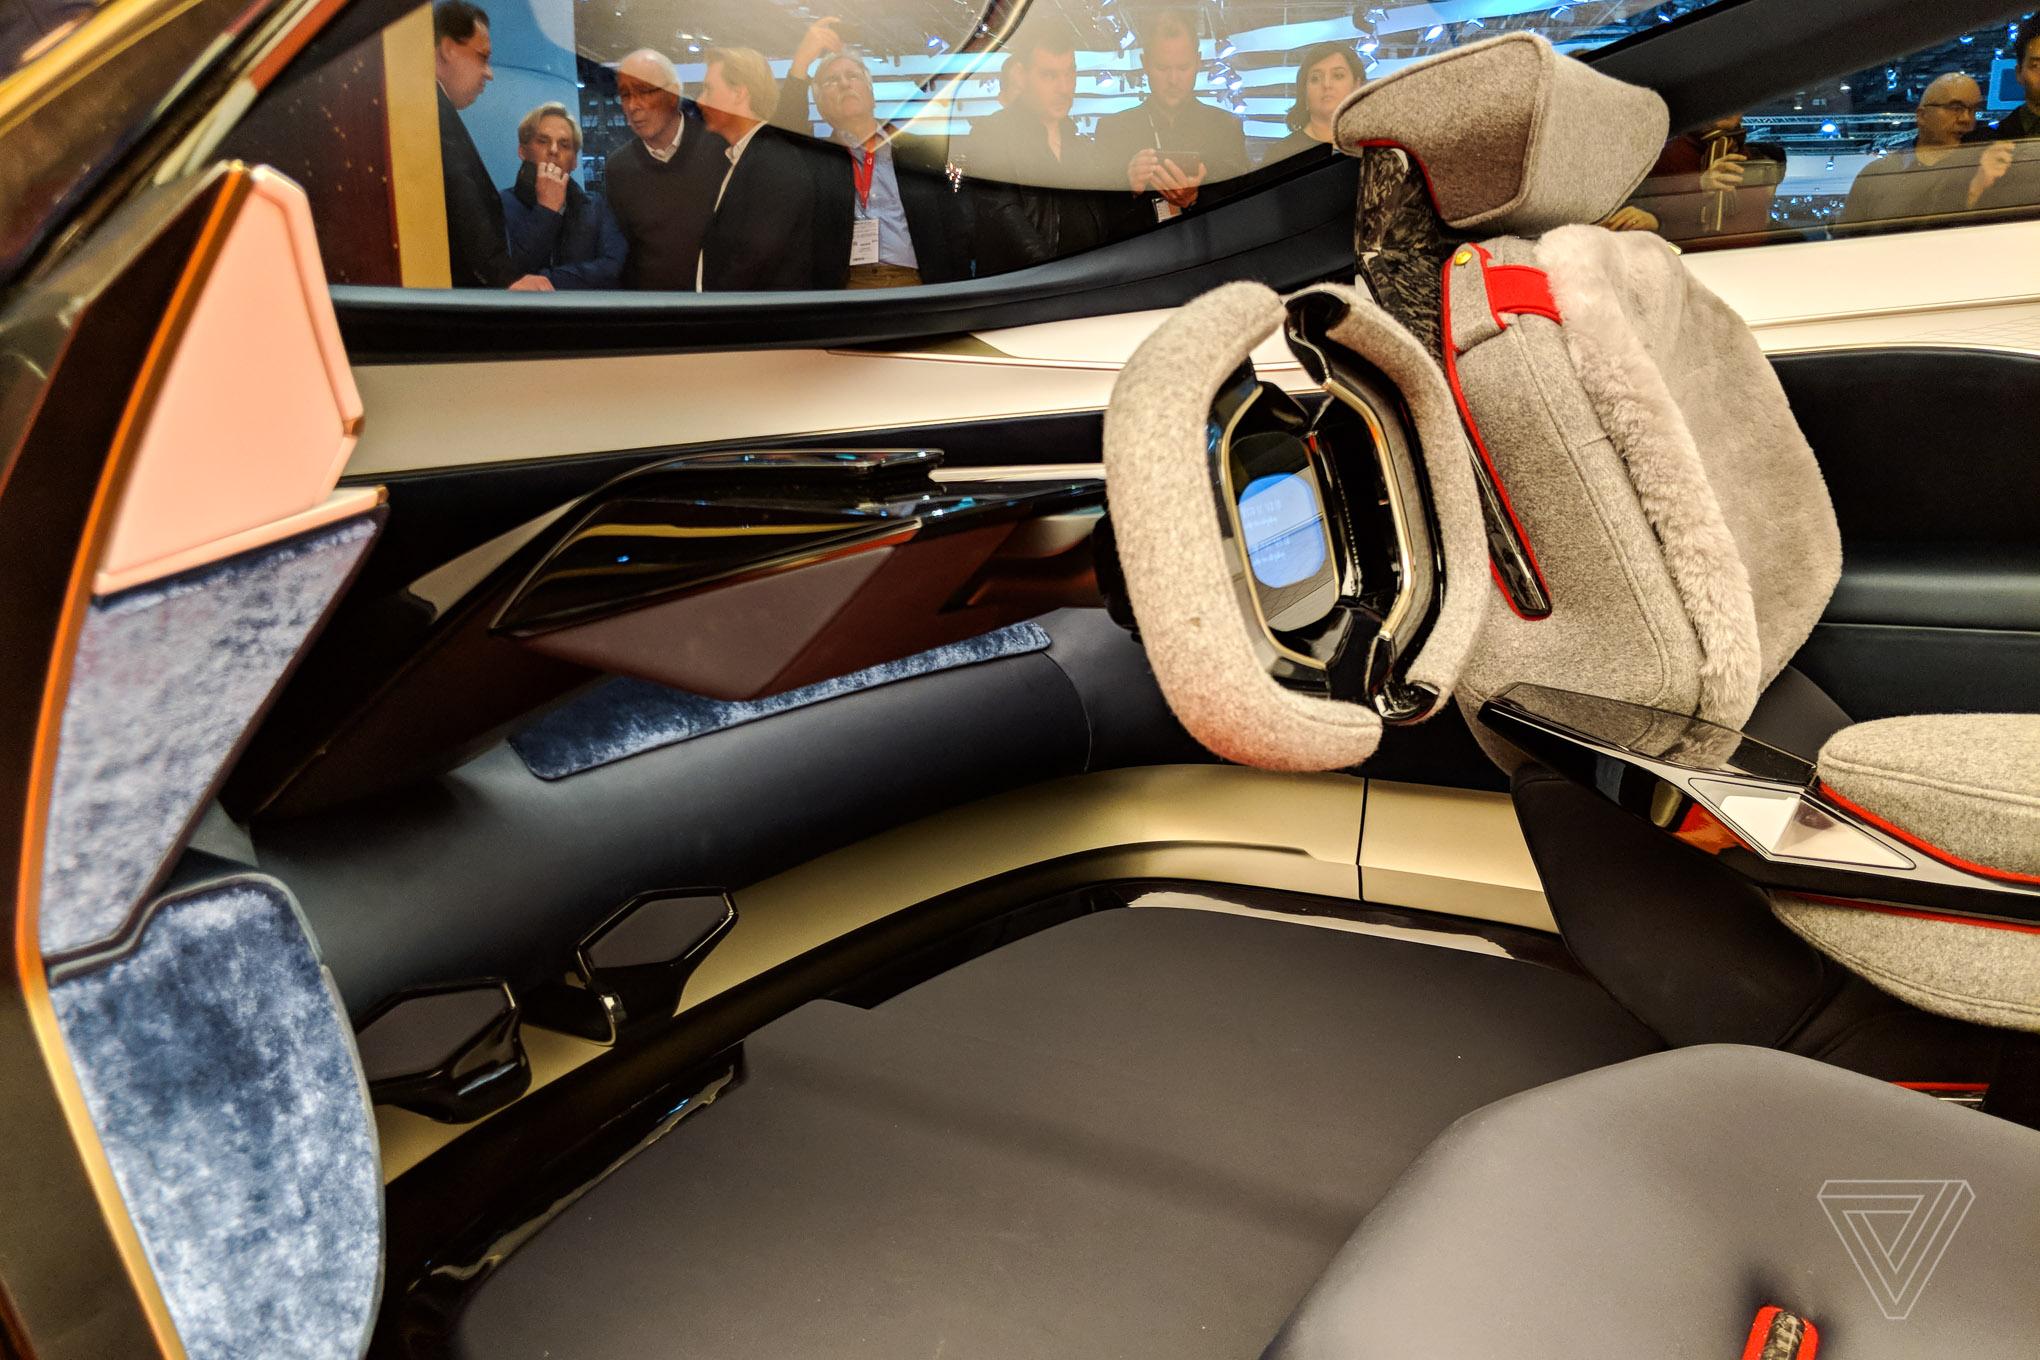 Aston Martin S Lagonda Concept Car Is Breathtaking The Verge